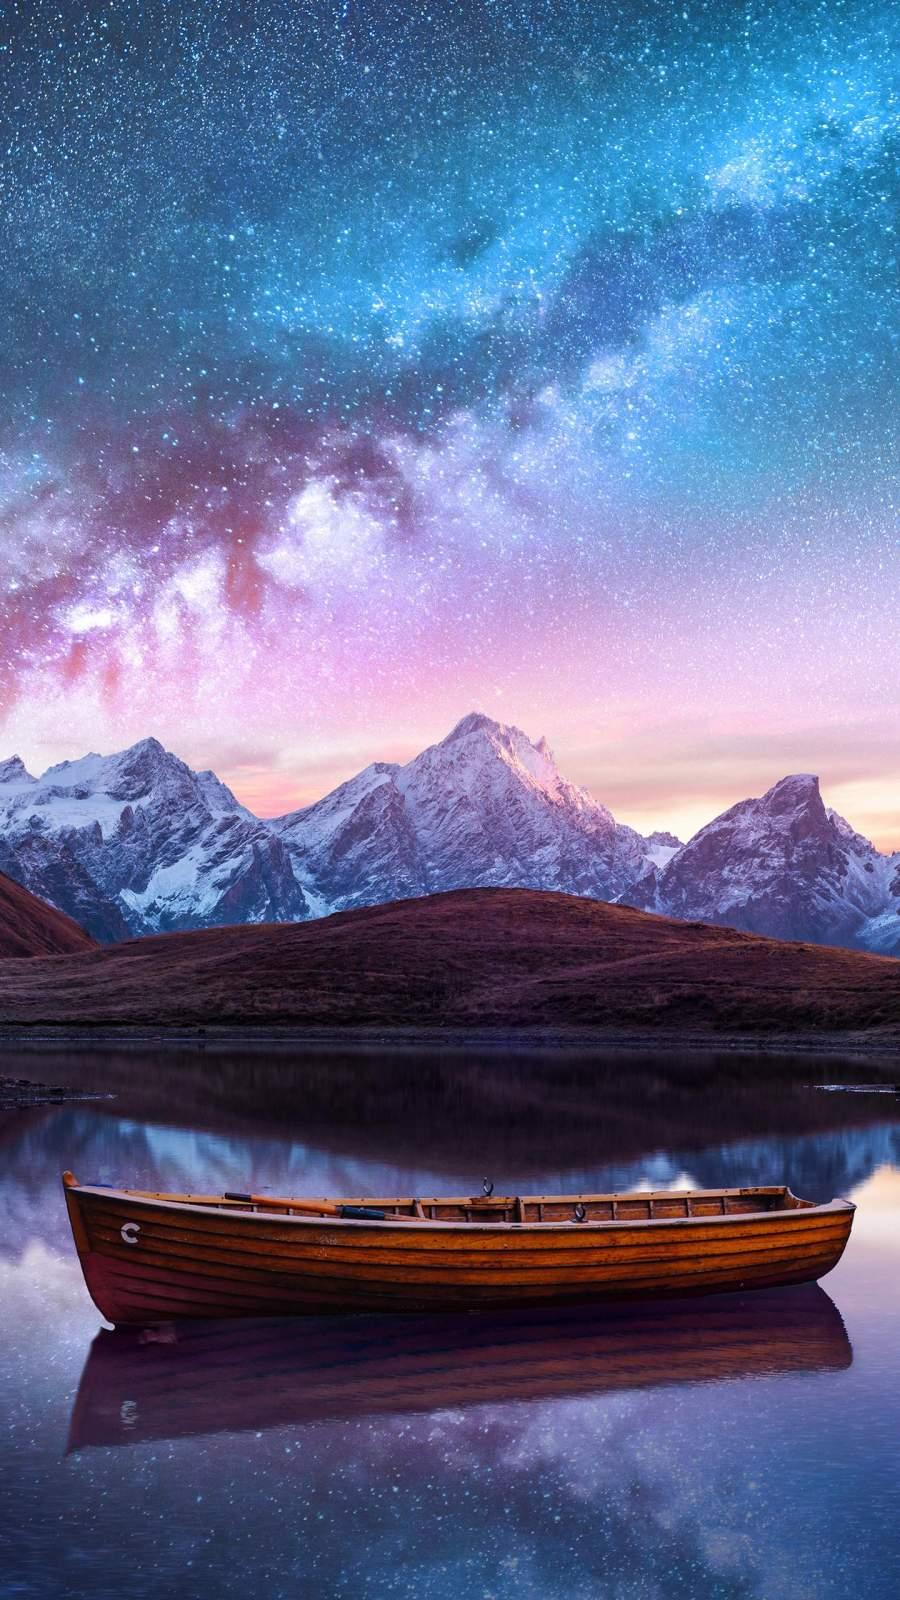 Starry Night Lake iPhone Wallpaper